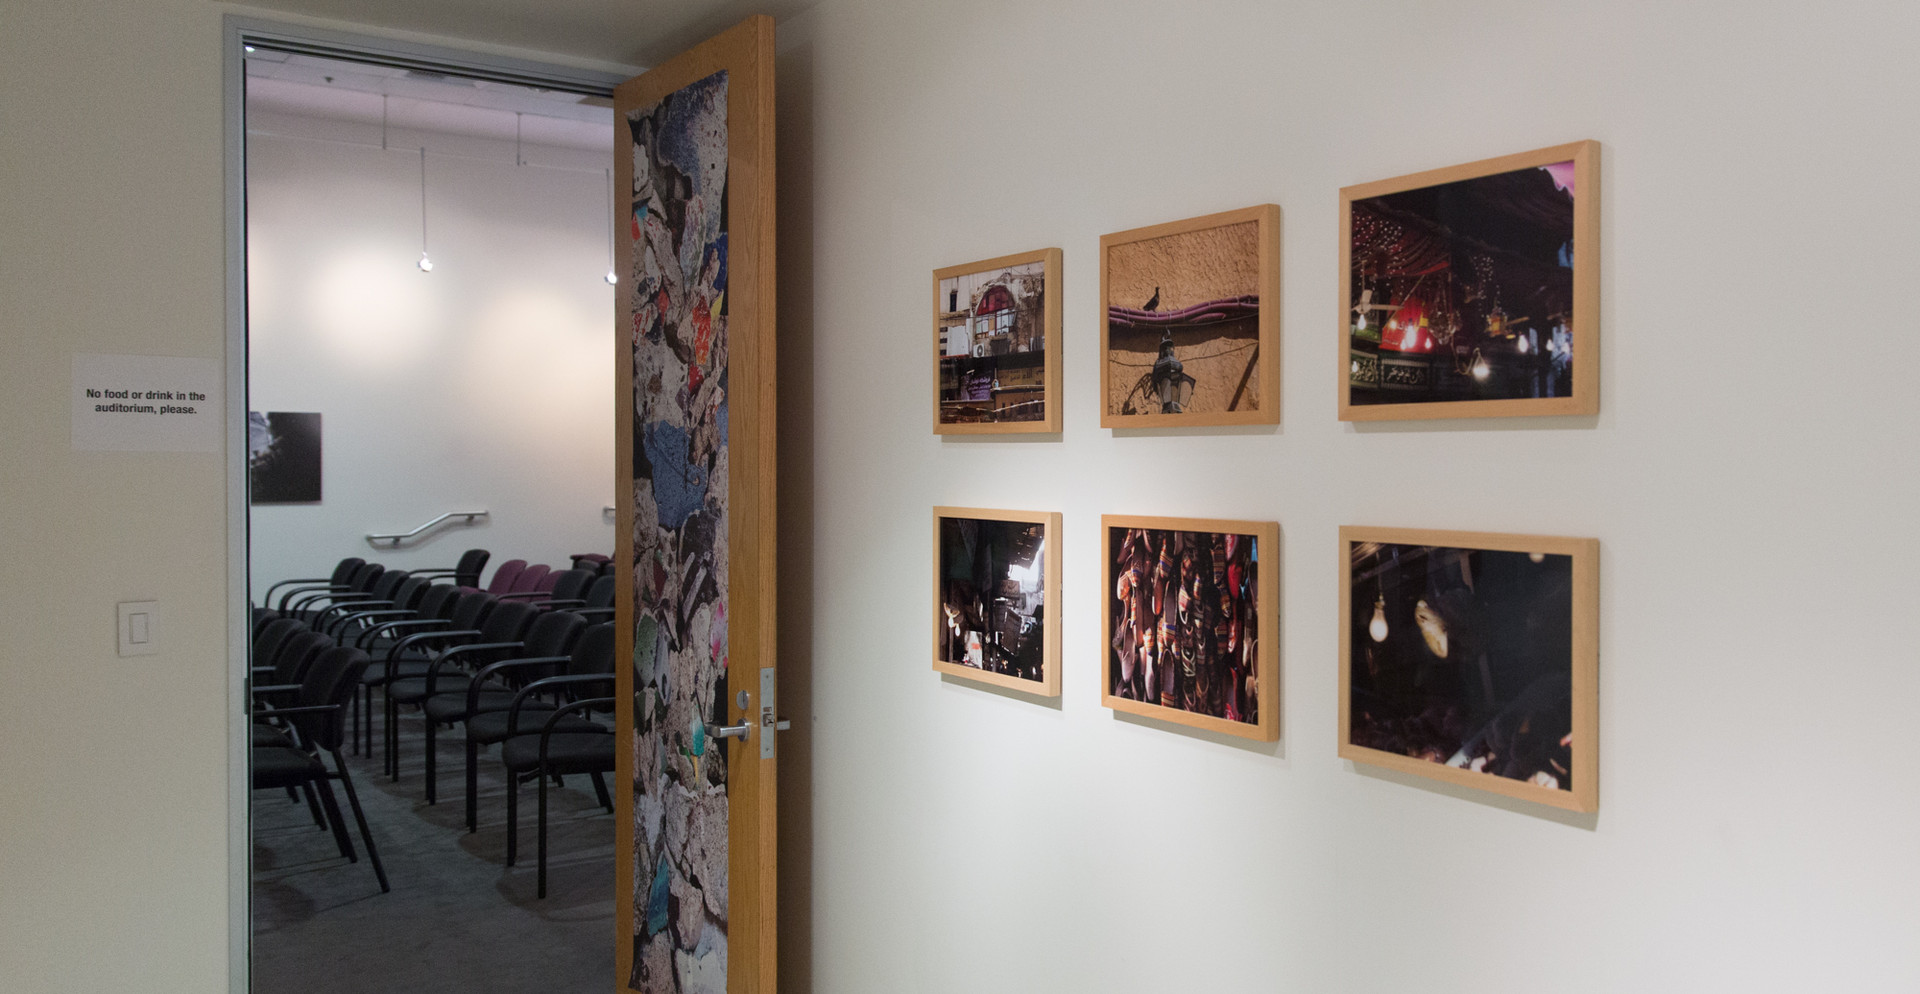 ity lights - Damascus 2011, Goethe Institute, Los Angeles, USA